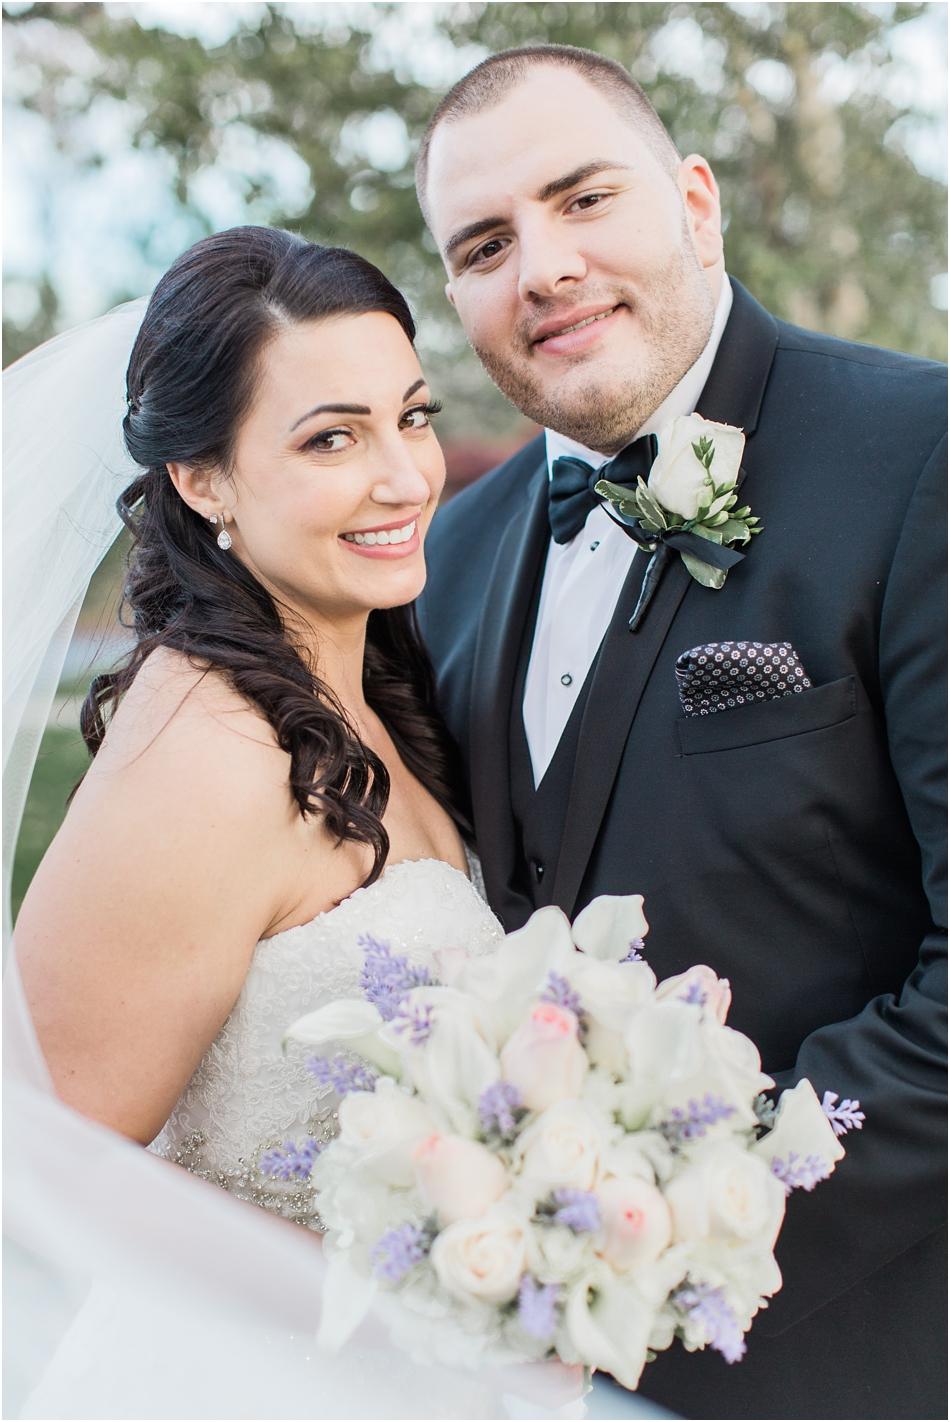 north_reading_lauren_sal_ballroom_cape_cod_boston_new_england_wedding_photographer_Meredith_Jane_Photography_photo_0126.jpg